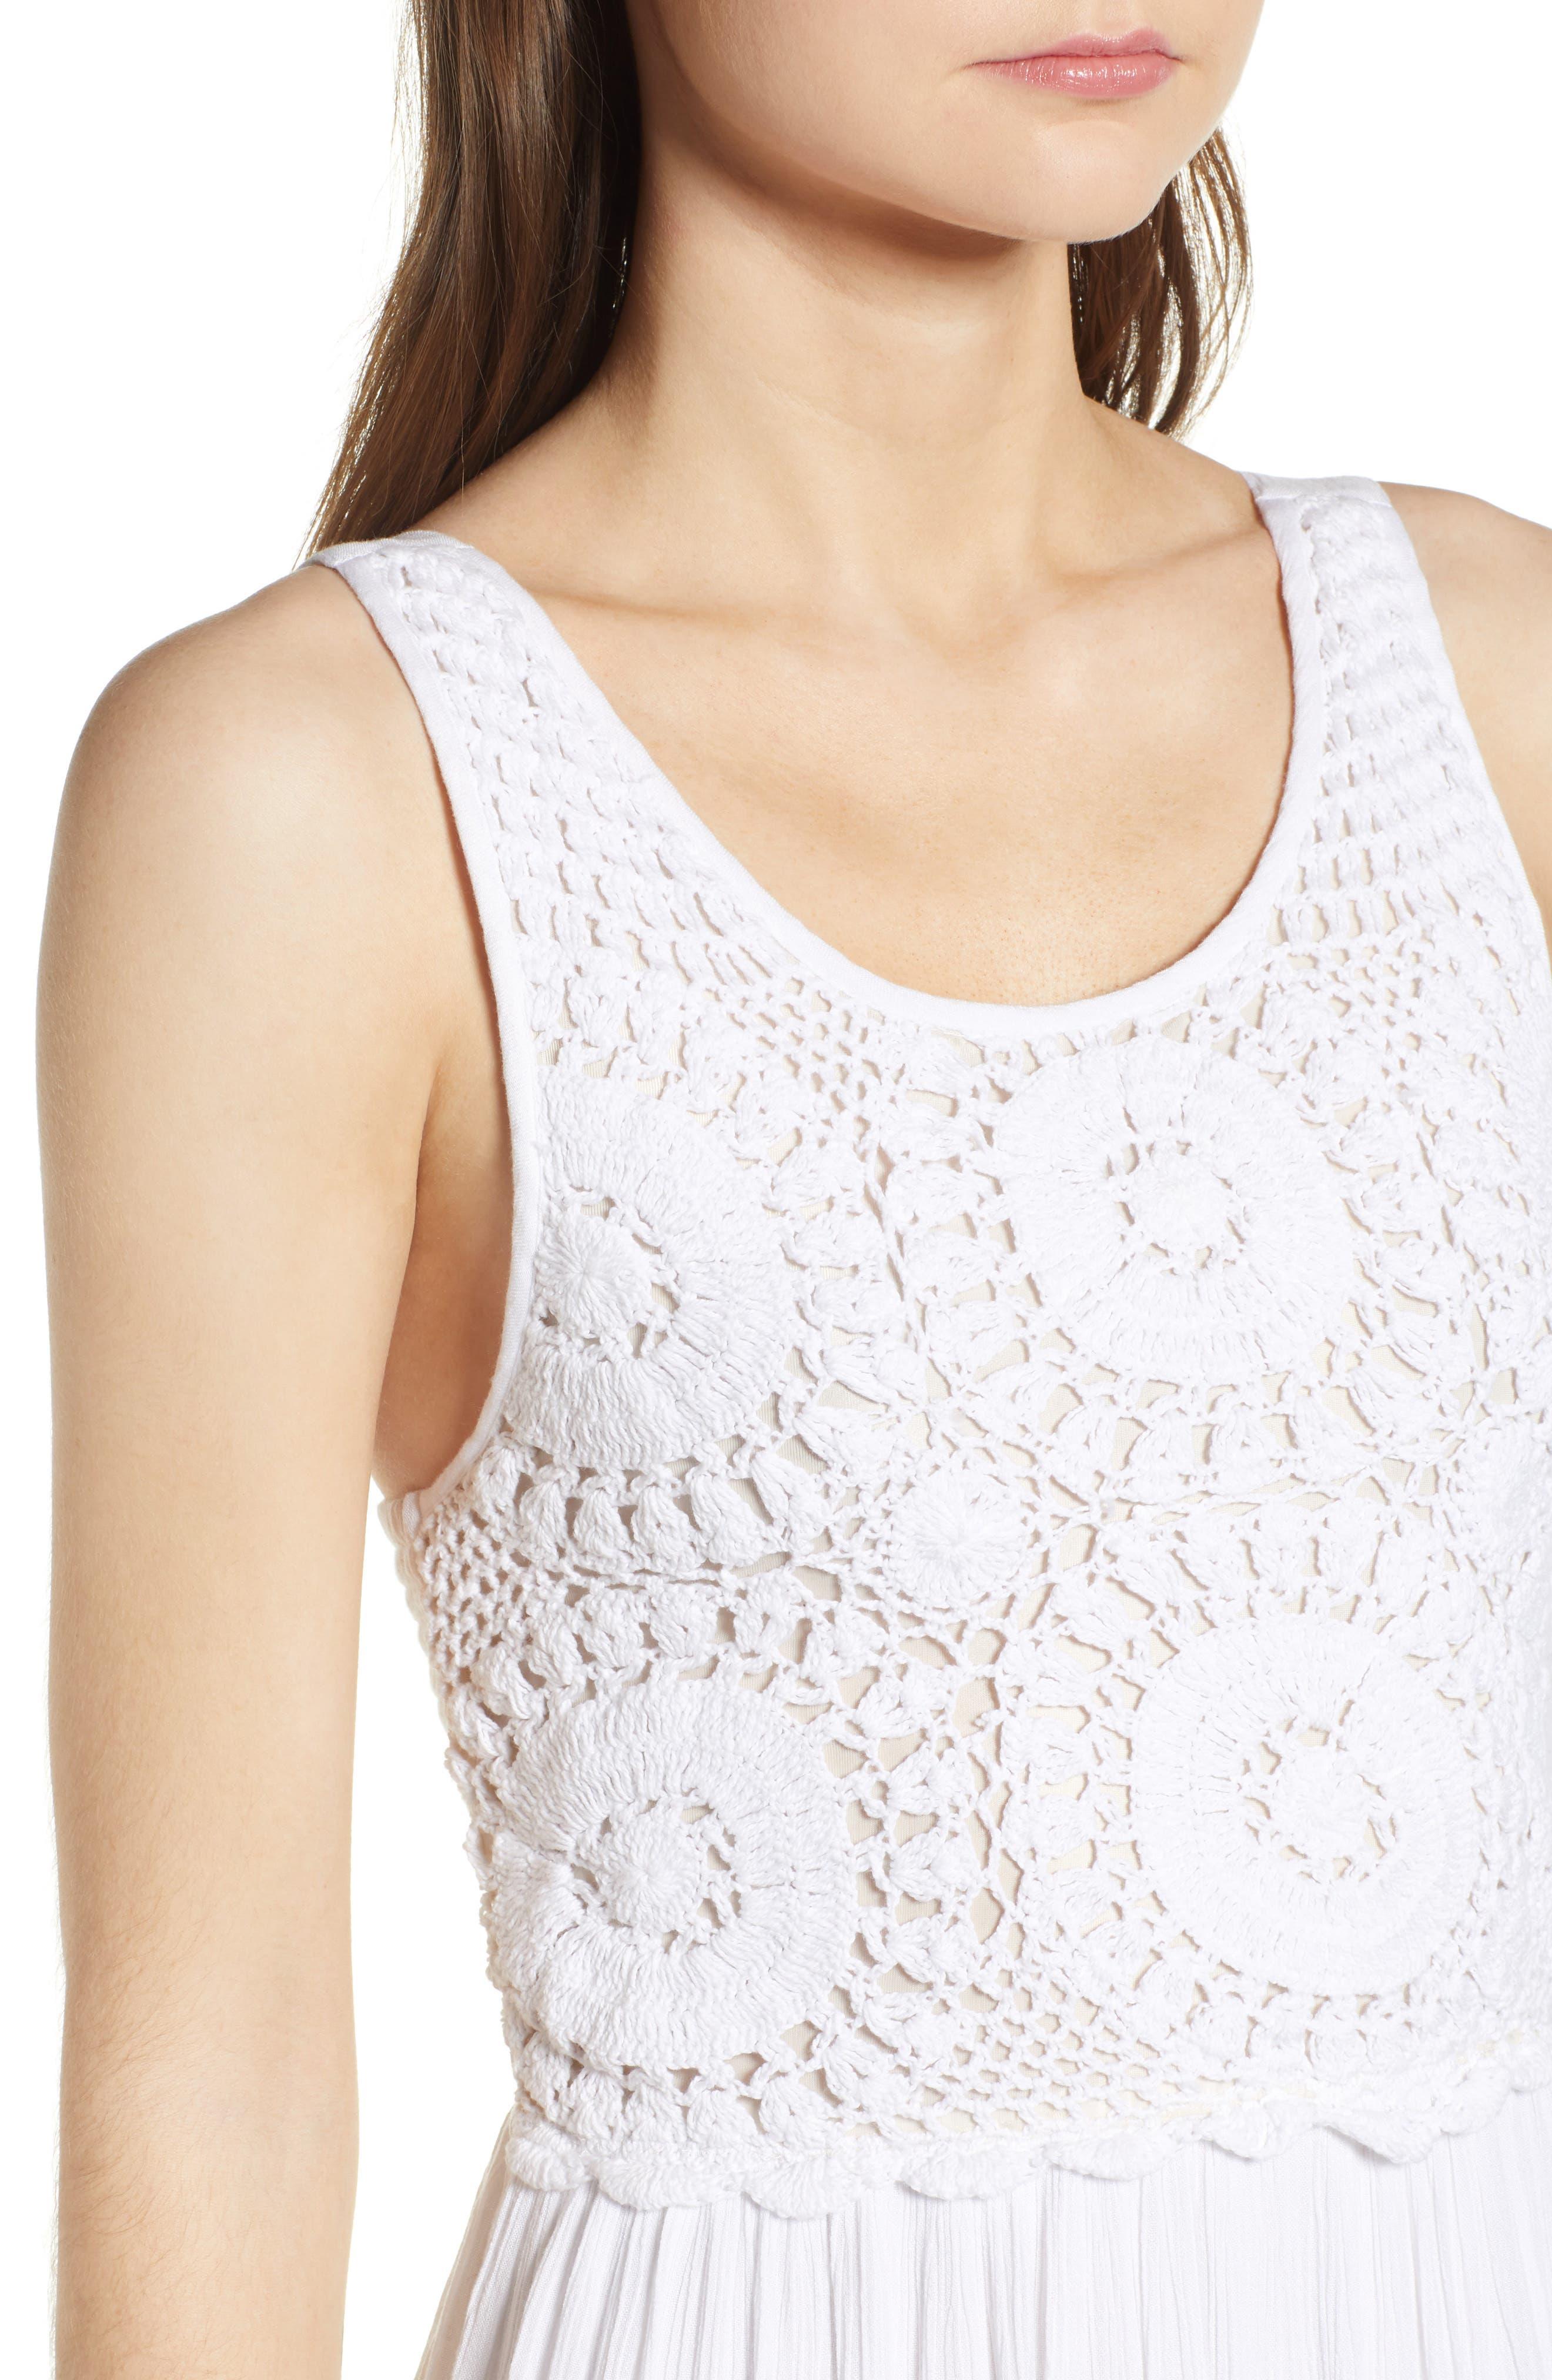 Bishop + Young Bora Bora Maxi Dress,                             Alternate thumbnail 4, color,                             White